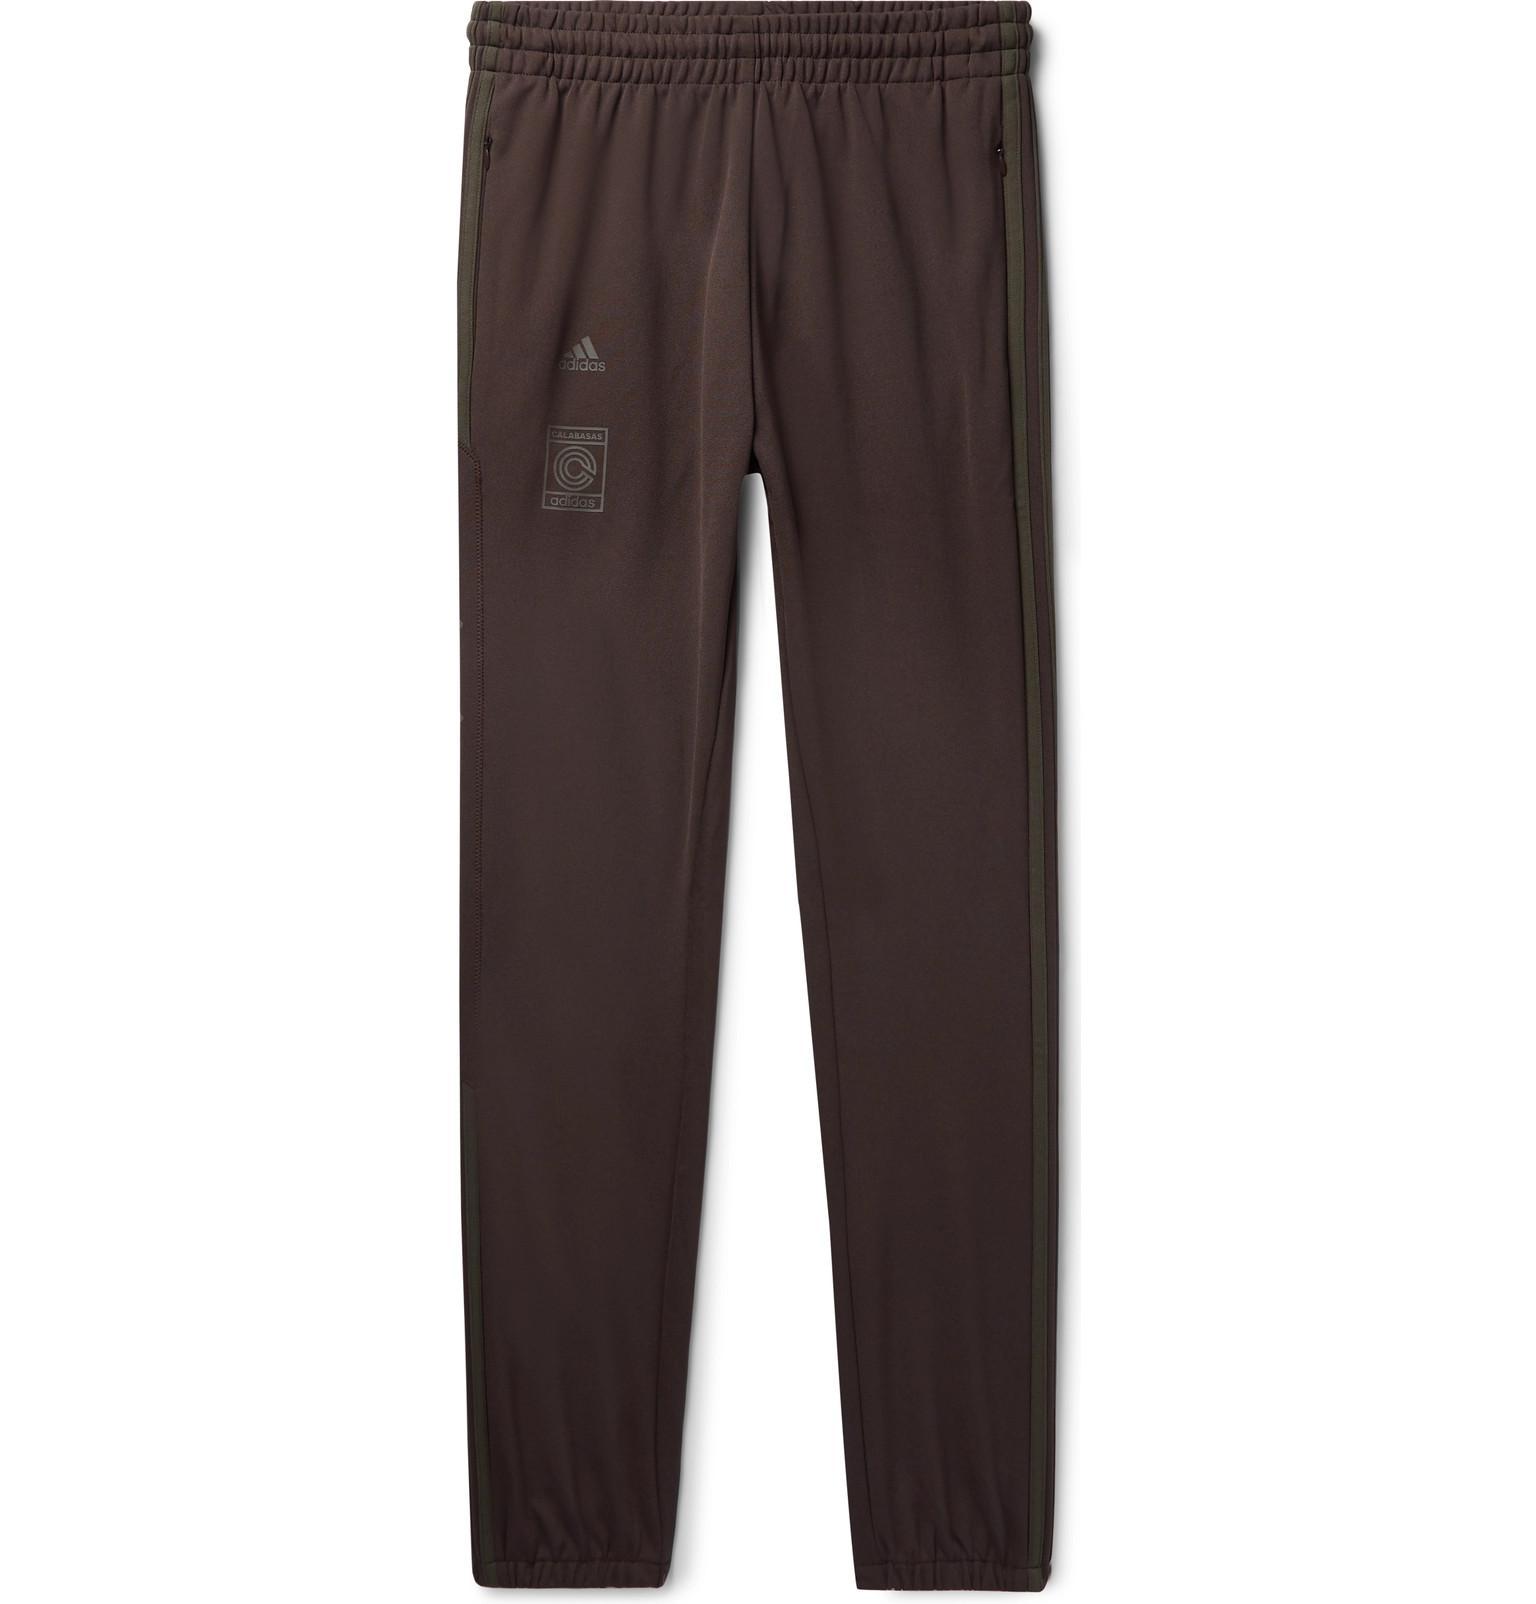 e133a25b adidas Originals + Yeezy Calabasas Striped Jersey Sweatpants in ...